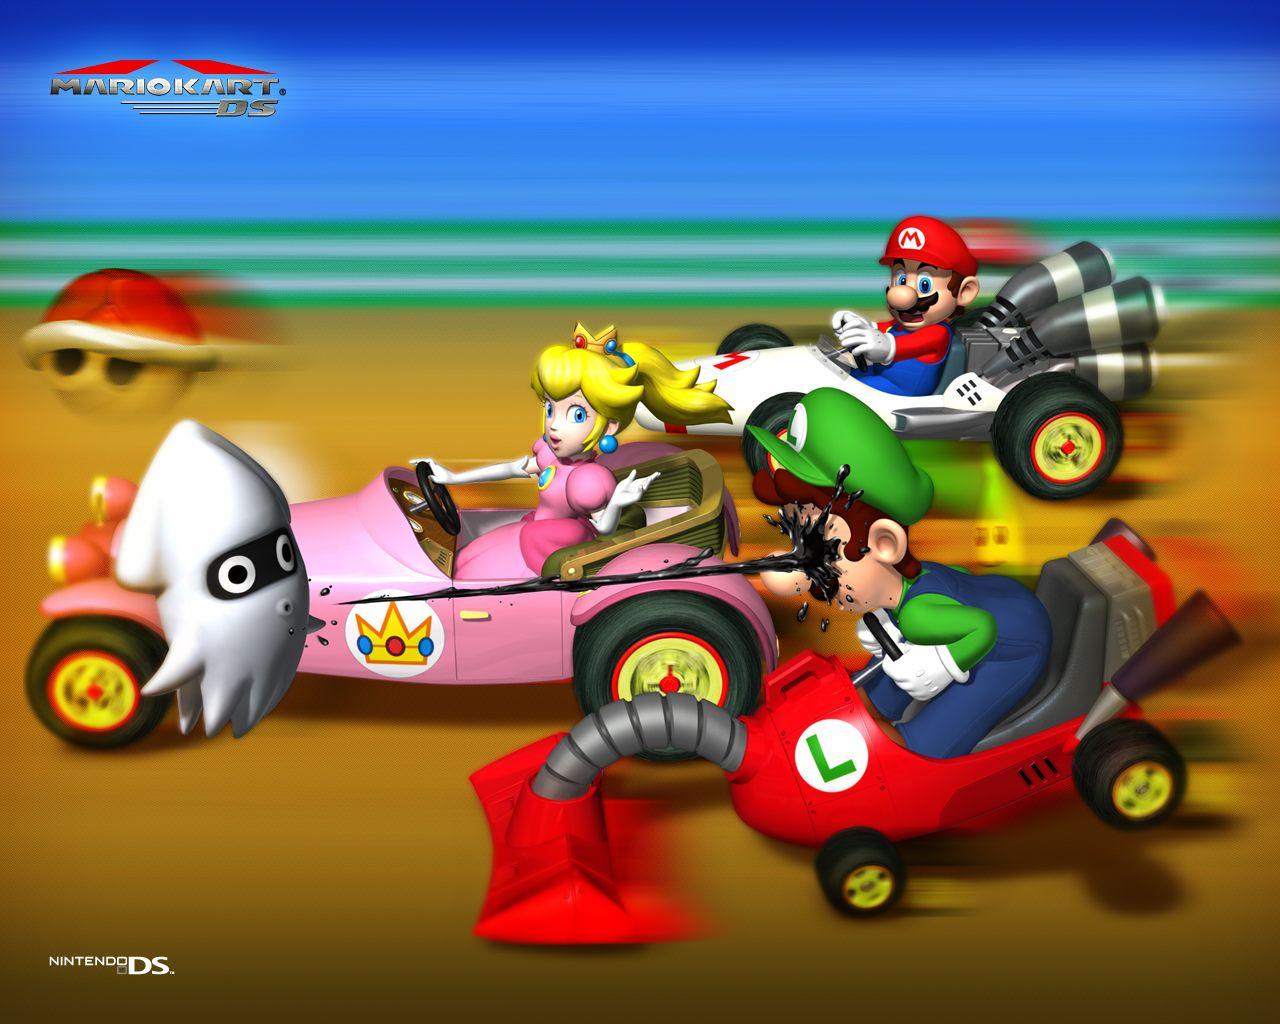 Nintendo Wallpaper Mario Kart Ds Mario Kart Mario Kart Ds Mario And Luigi